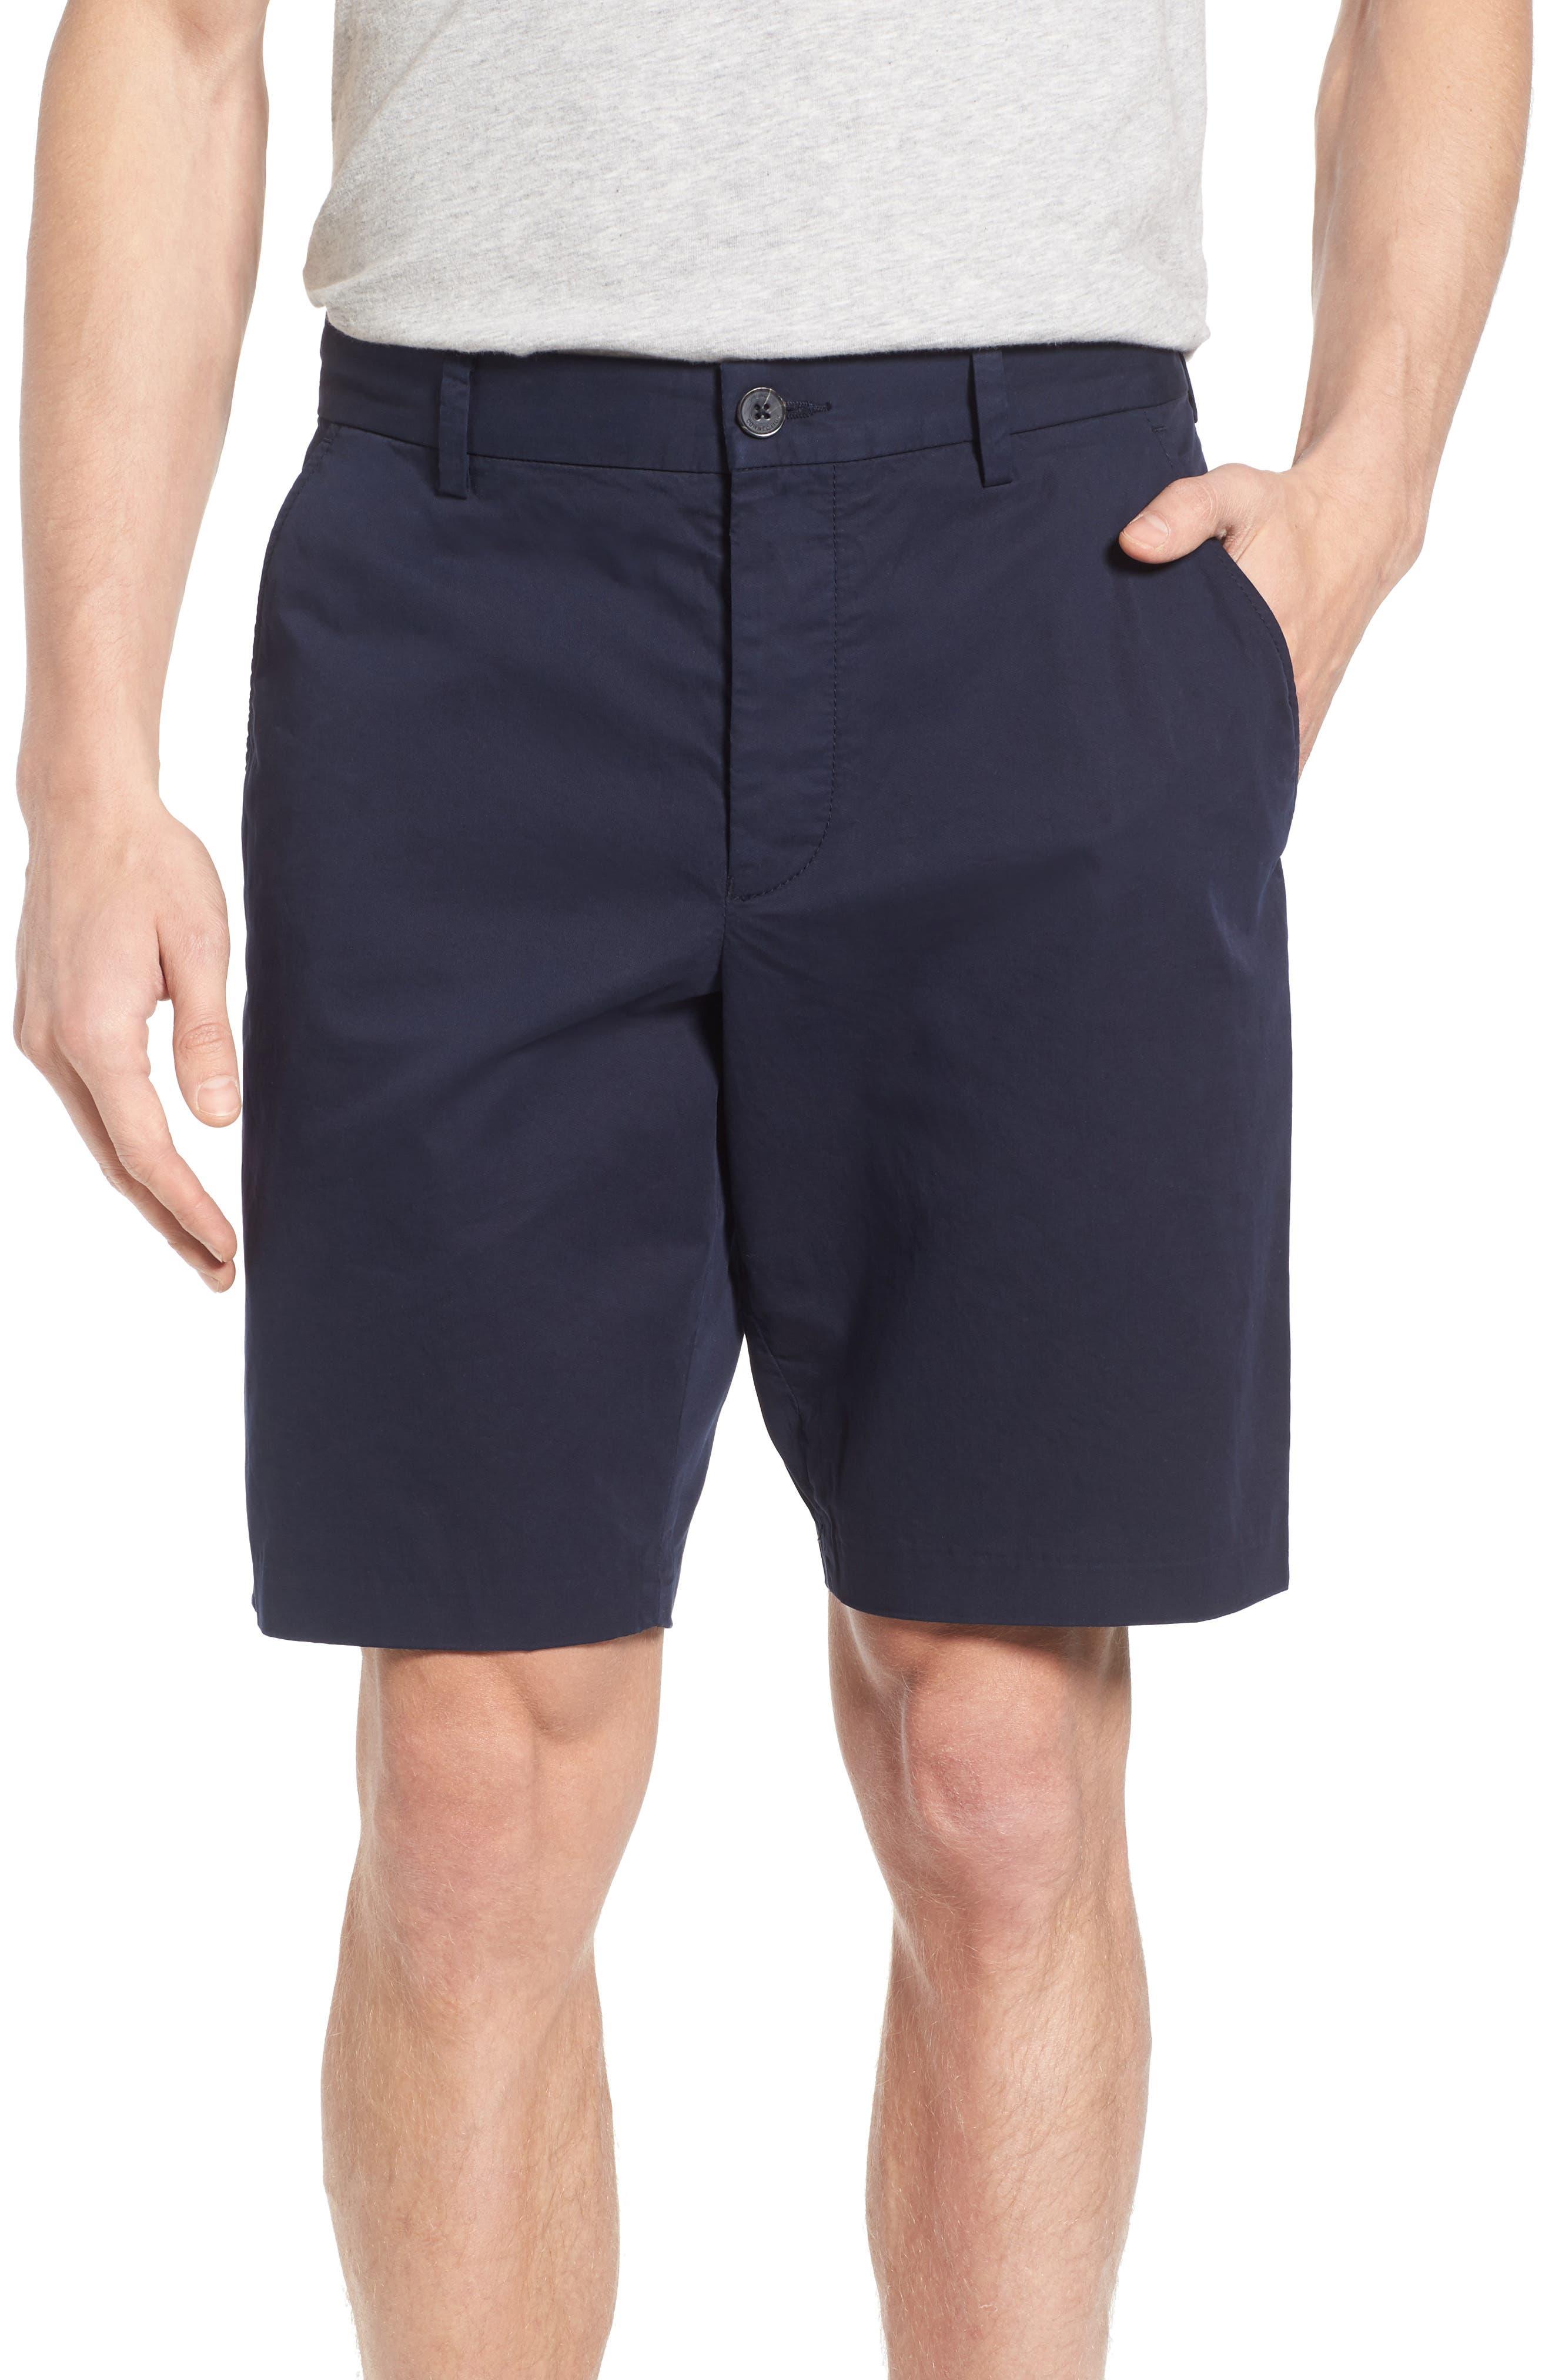 Peach Pie Flat Front Shorts,                         Main,                         color, Marine Blue